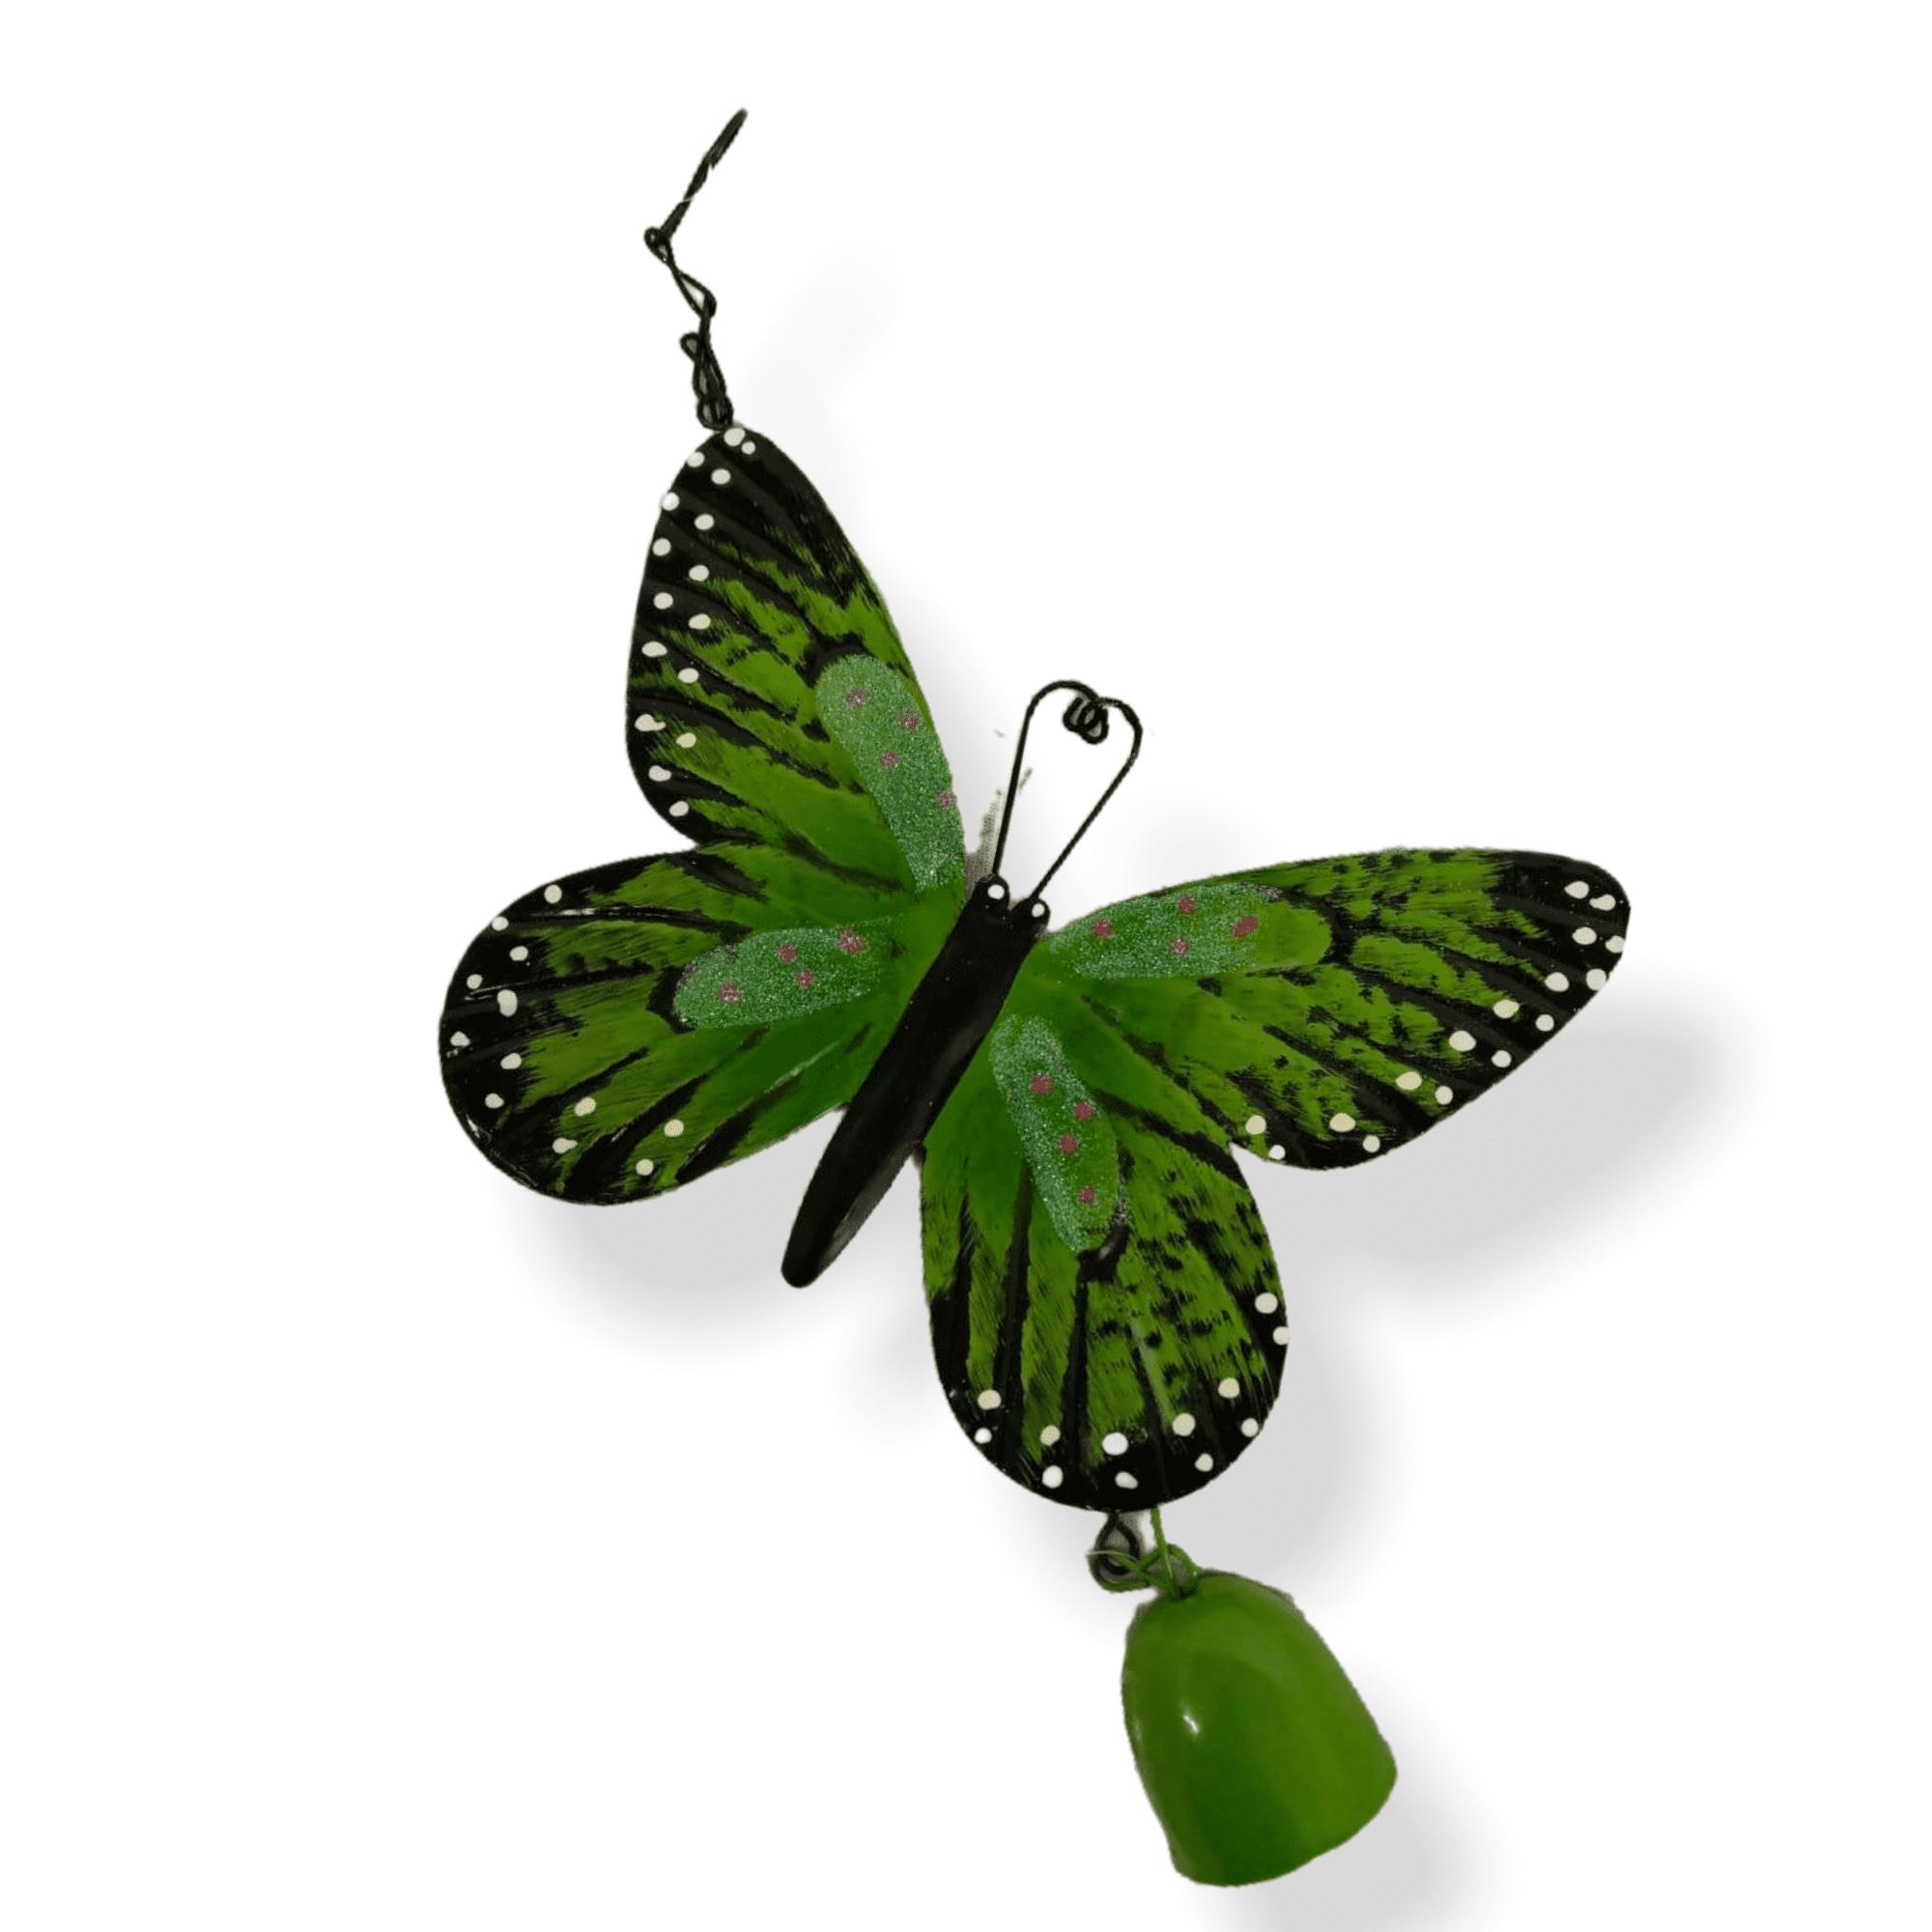 Gartenhänger Schmetterling grün